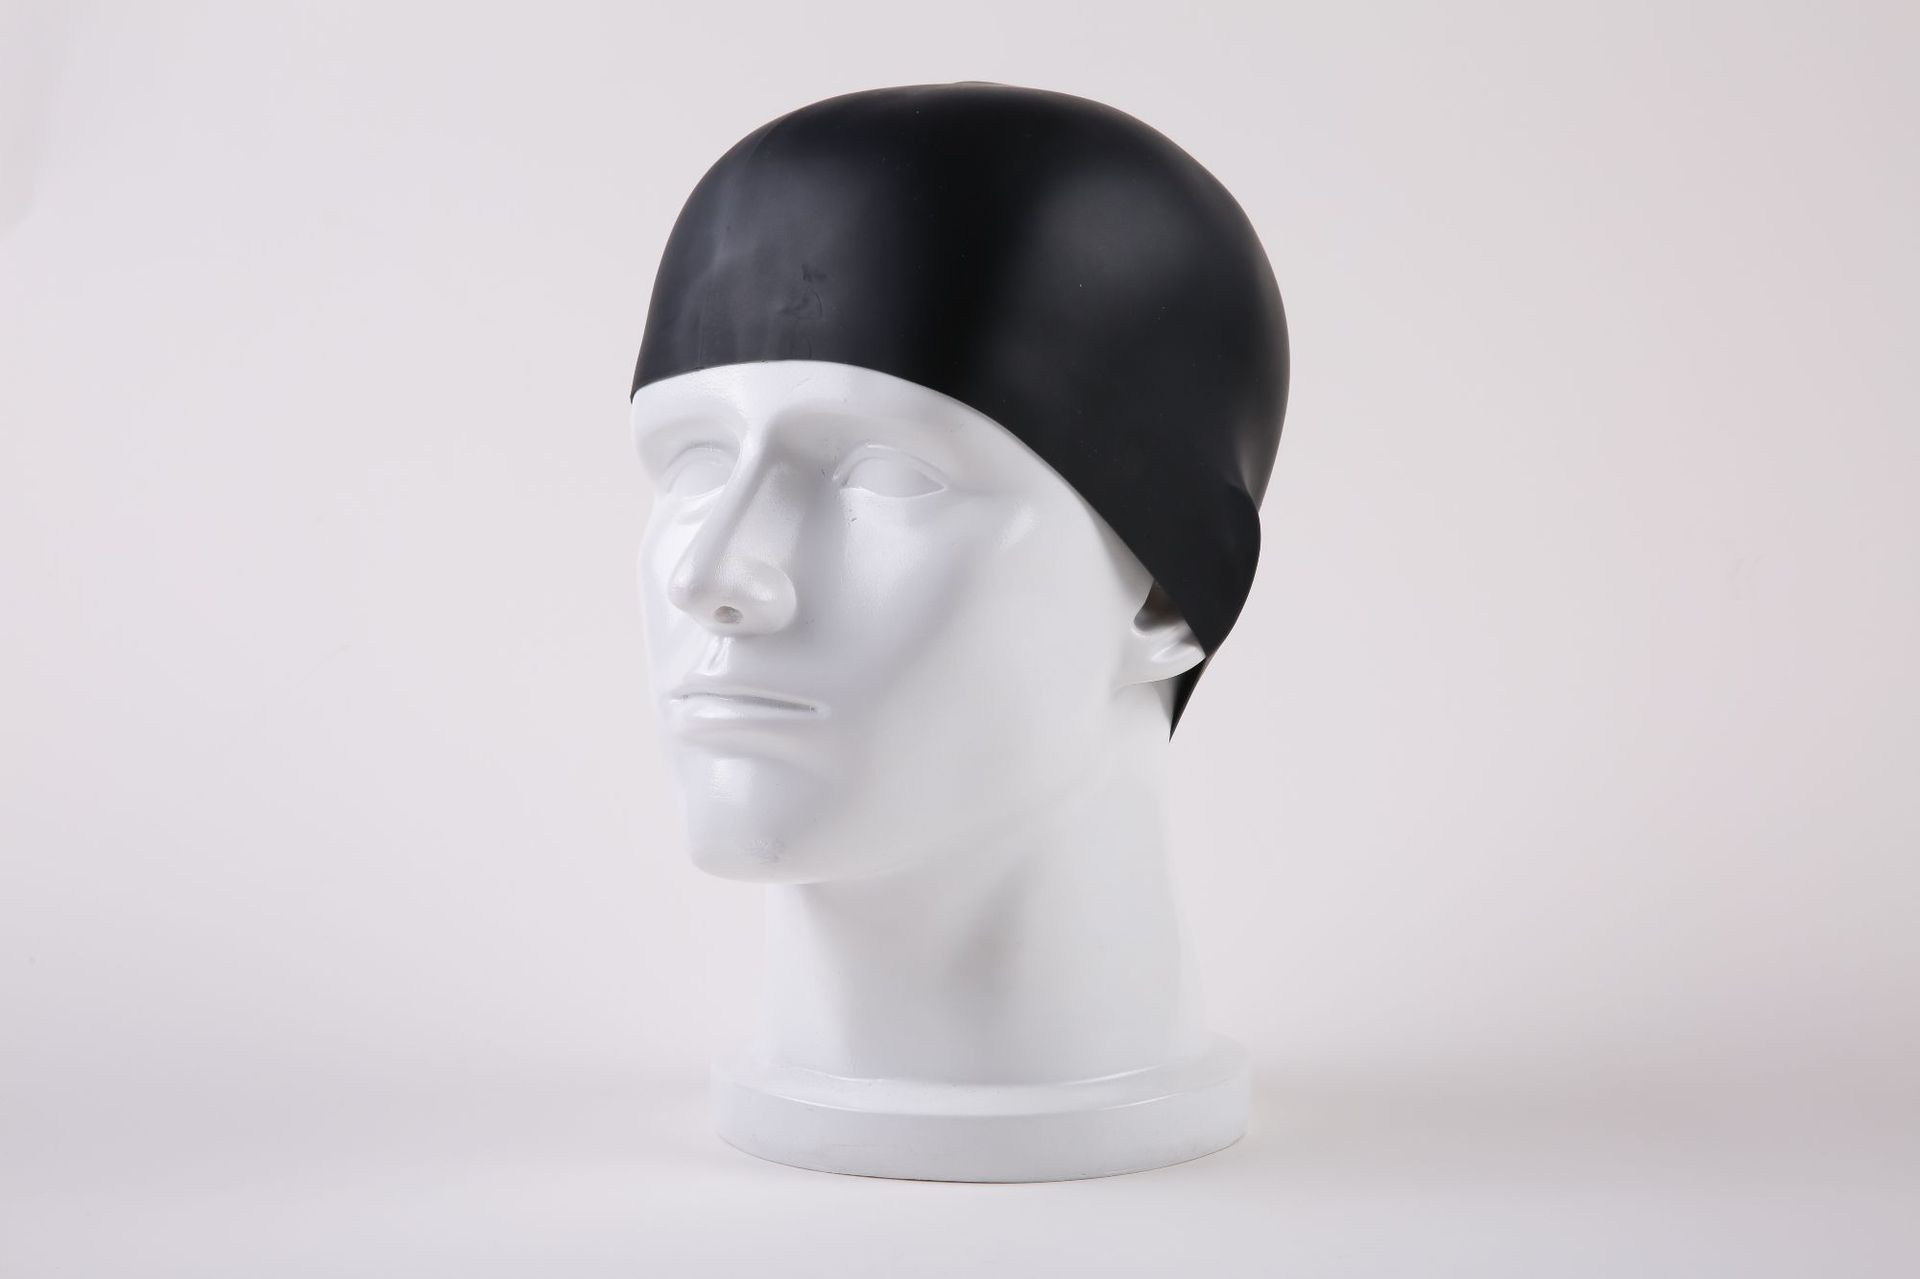 Mũ bơi silicon thời trang